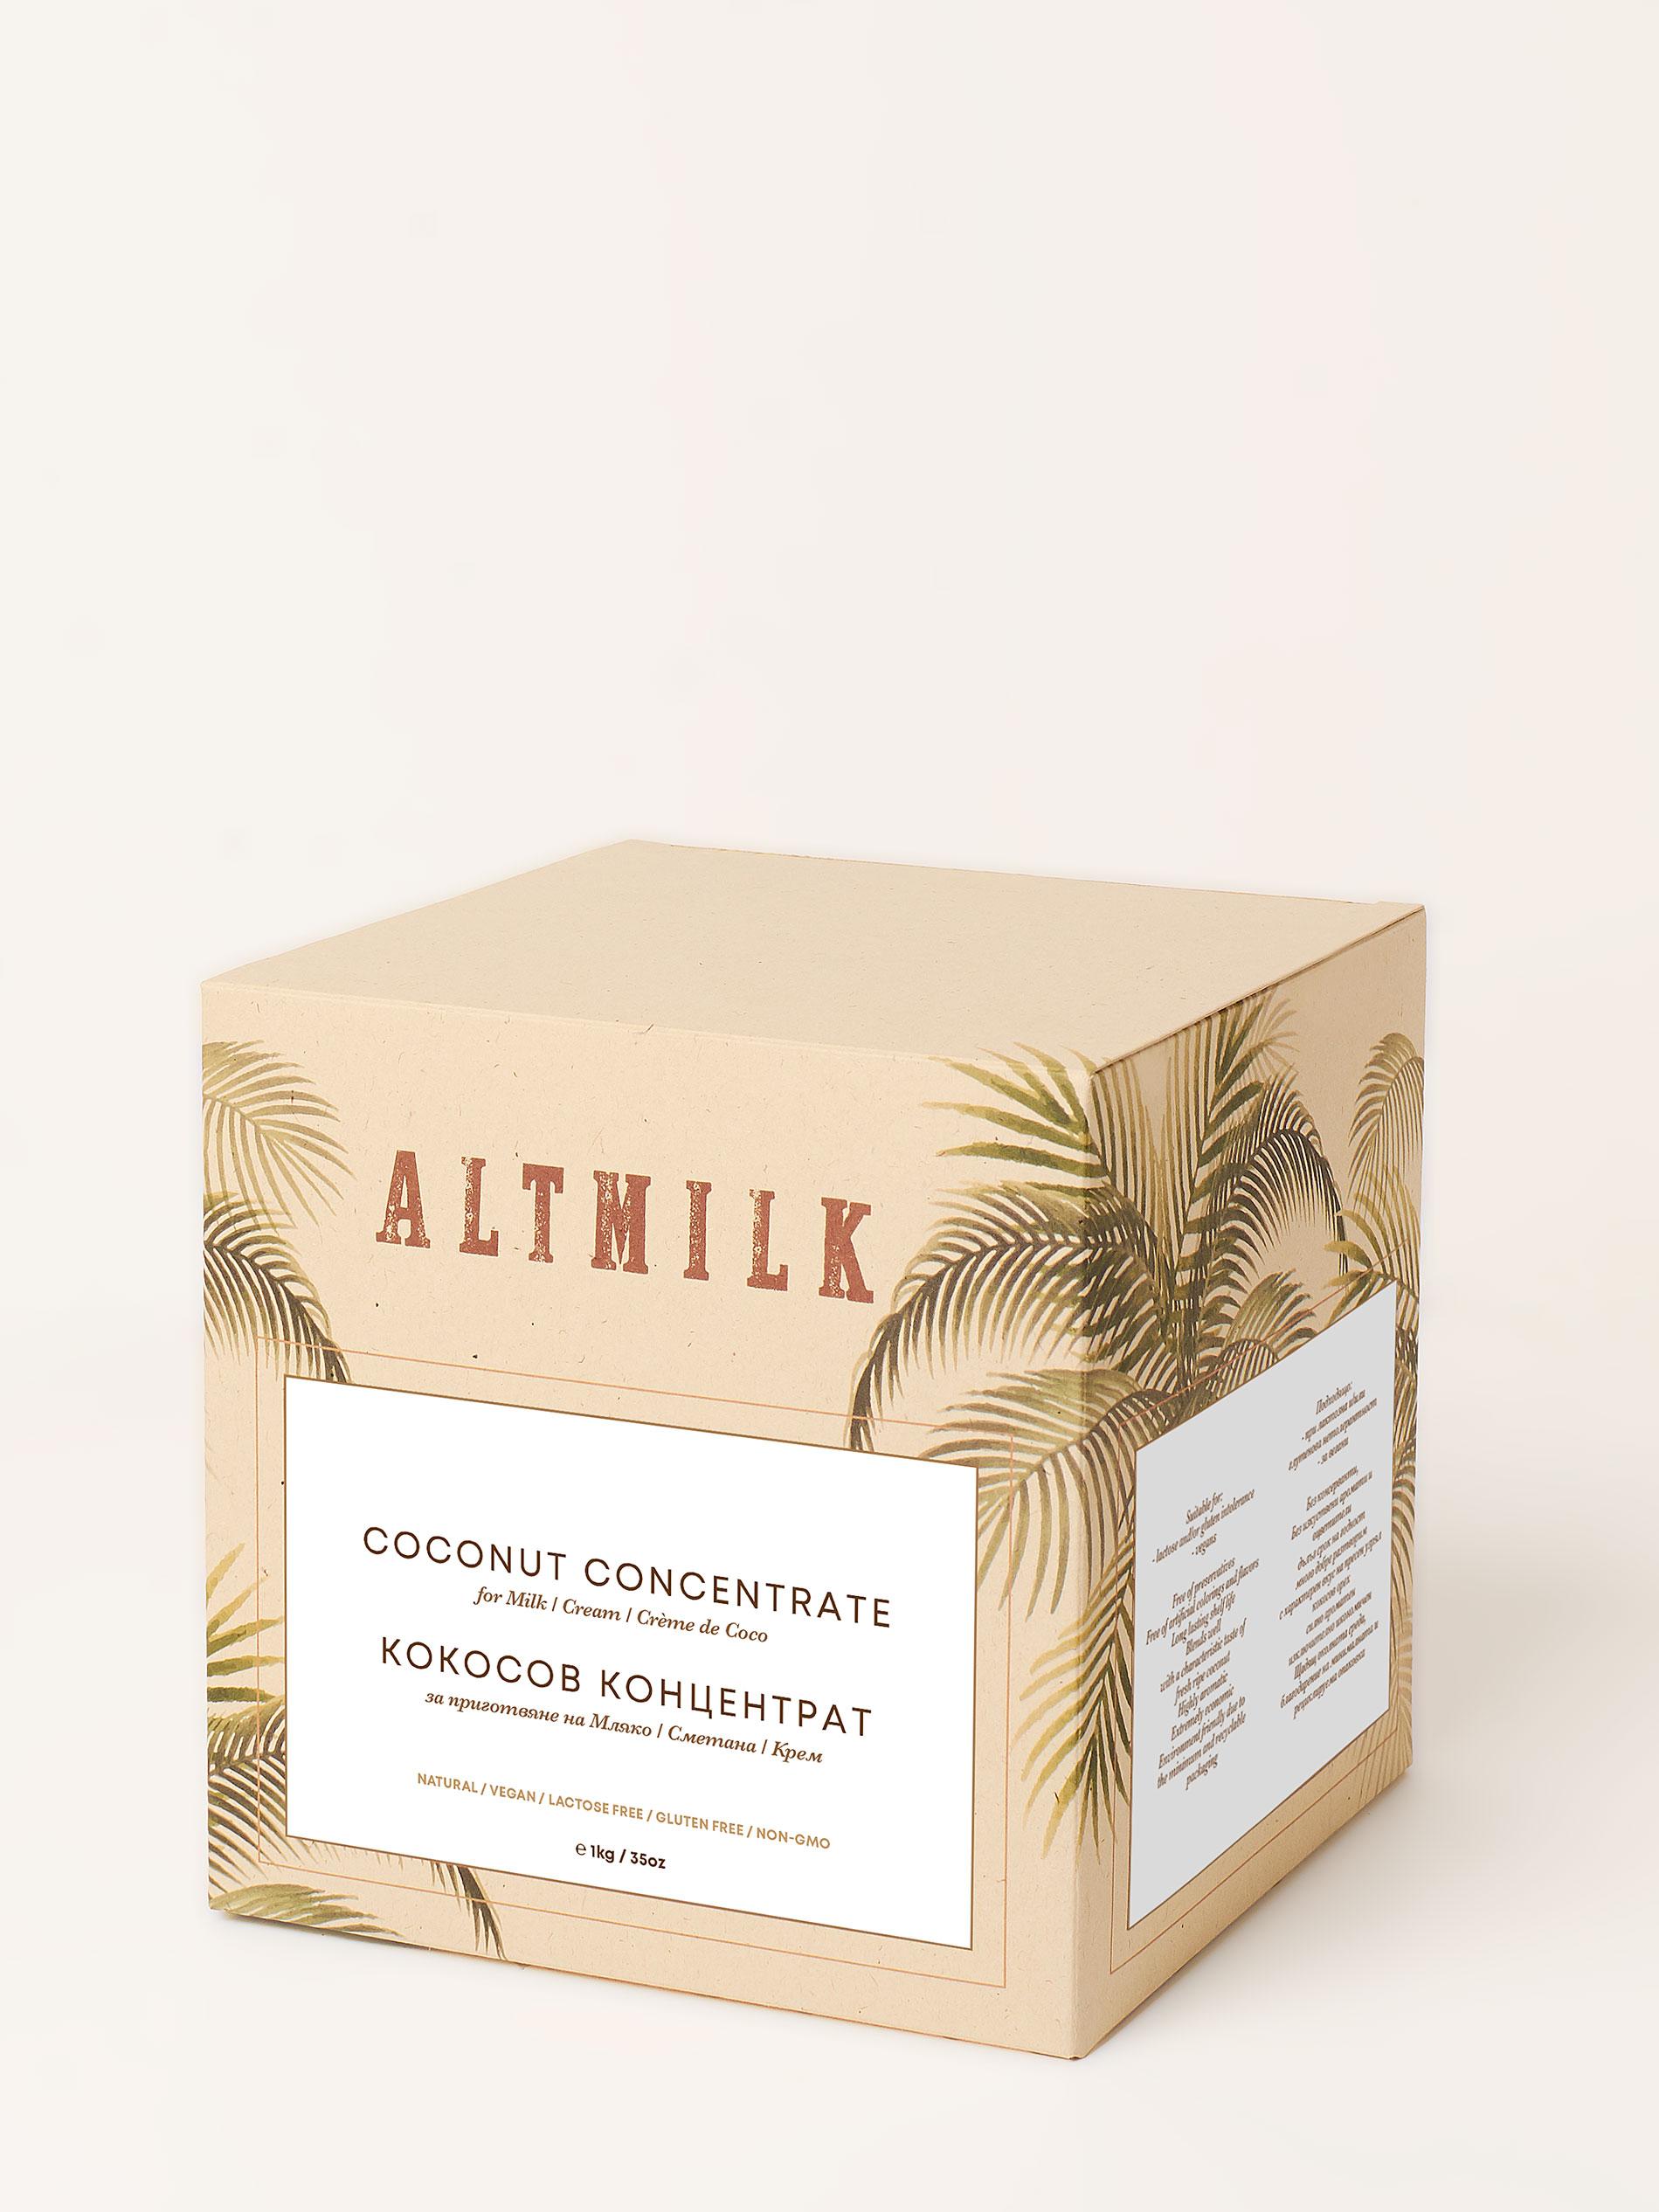 altmilk-boxes-01-flat